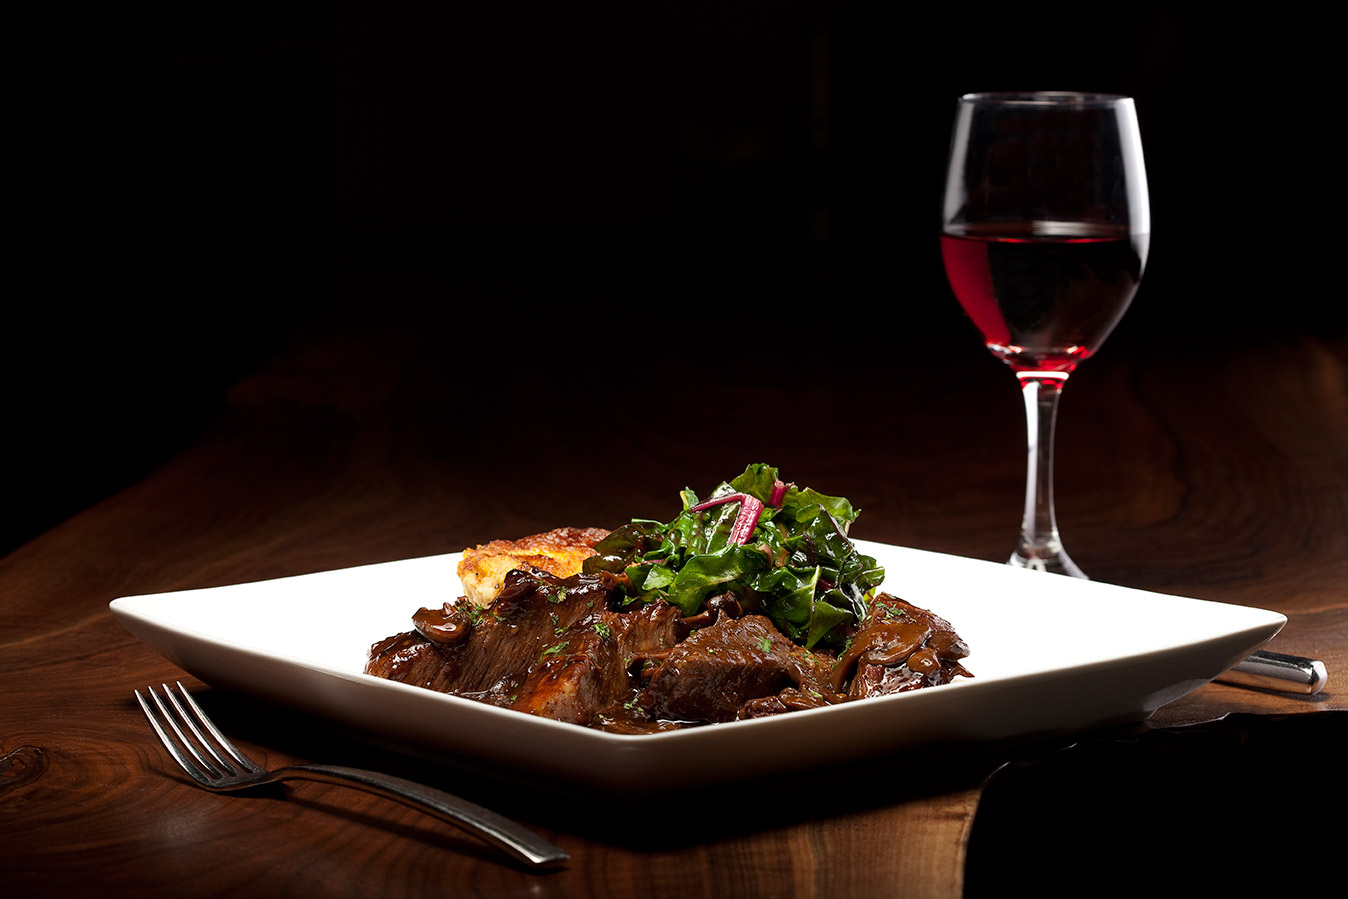 prasino - la grange, illinois - dinner wine beef